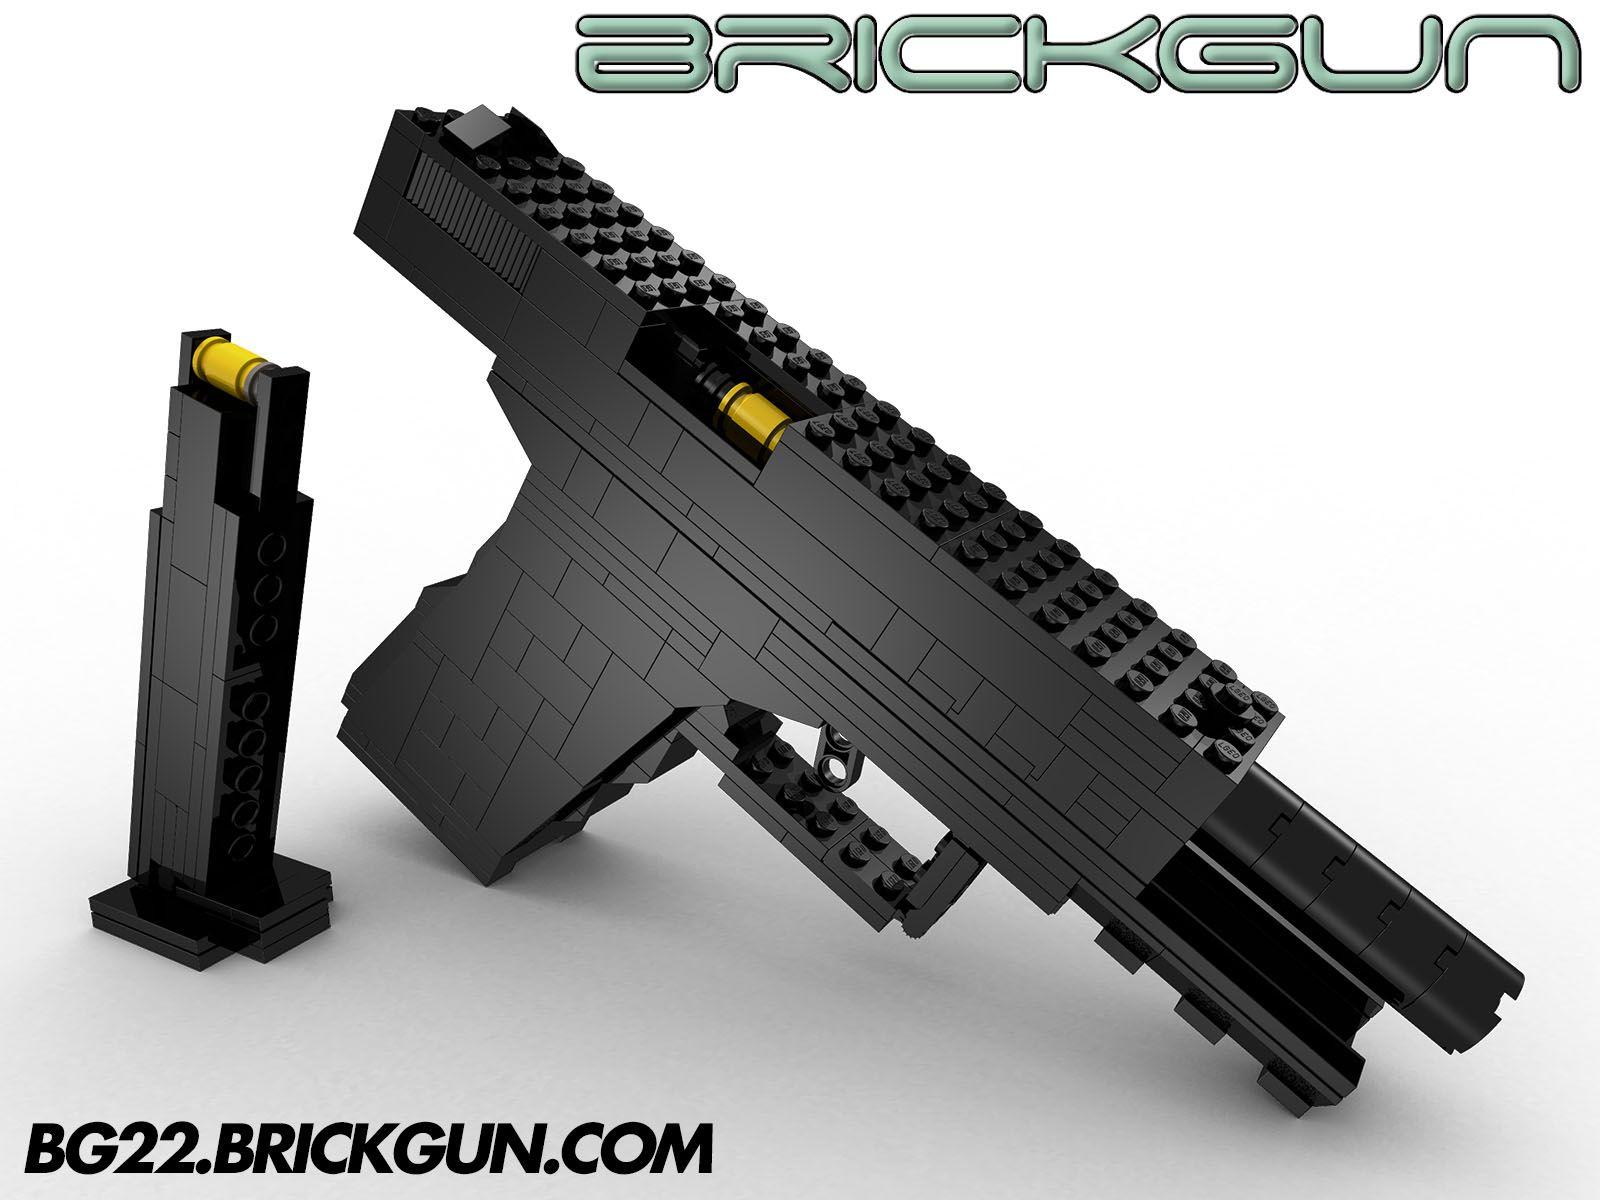 The Brickgun Lego Bg22 With Magazine Our Handgun Model That